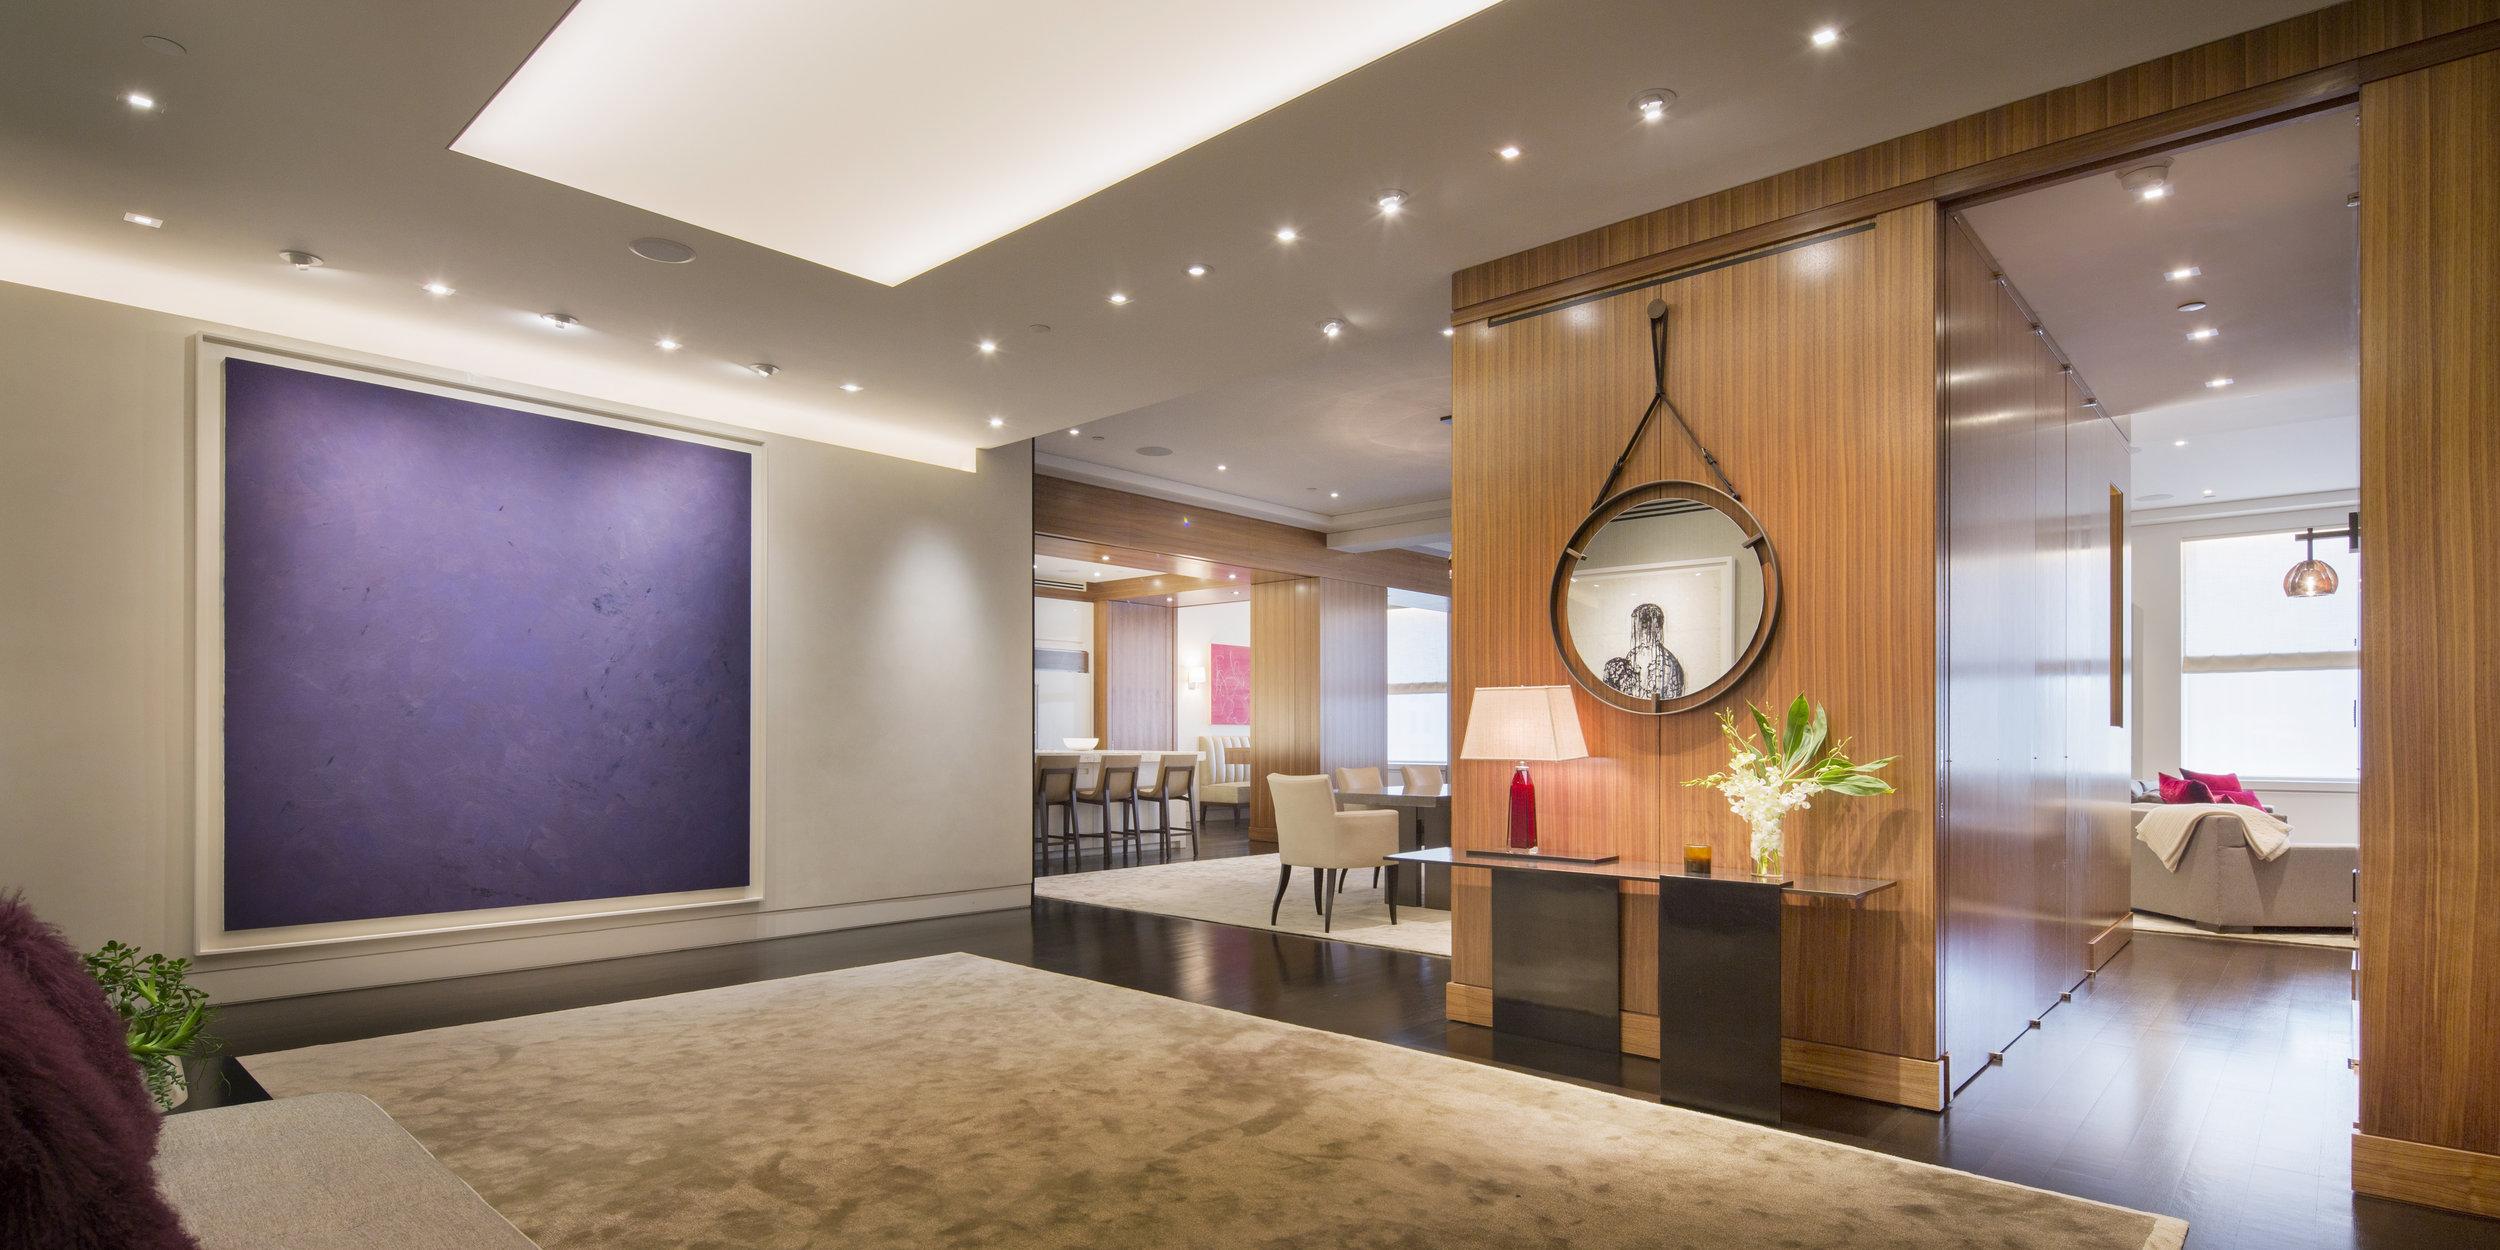 Artist: Joe Goode, Interior Design: Campion Platt, Photographer: Scott Frances Location: New York, New York